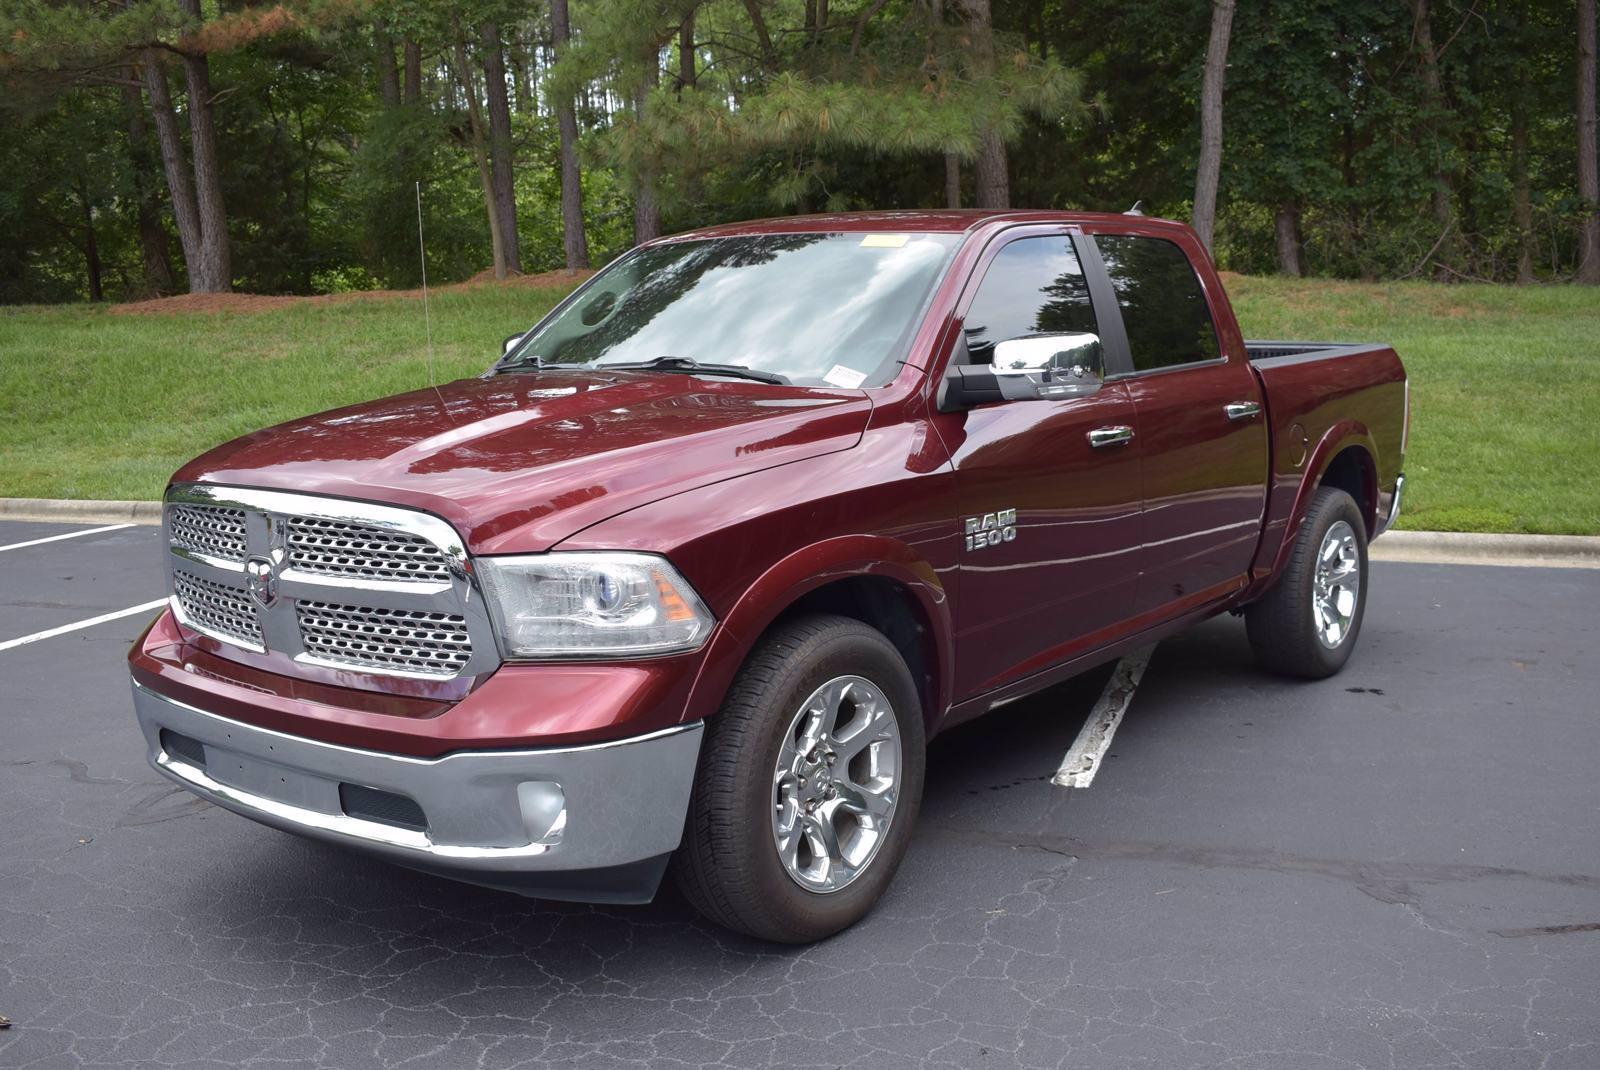 2016 Ram 1500 Vehicle Photo in Cary, NC 27511